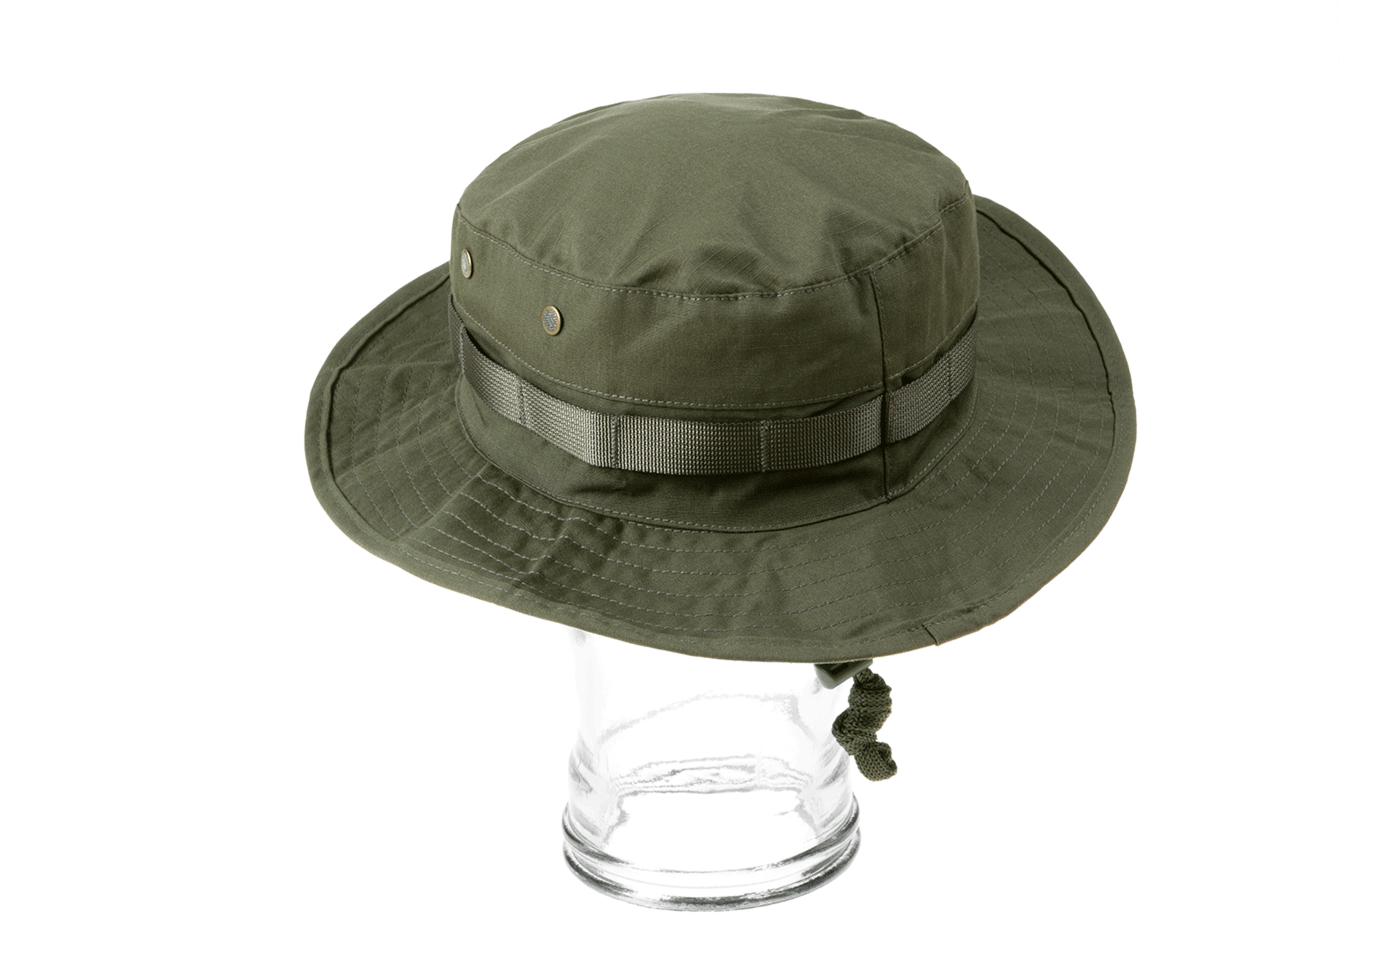 9f48c6ade4f Boonie Hat Ranger Green 59   L - Boonies - Headwear - Garments -  invadergear.ch Online shop